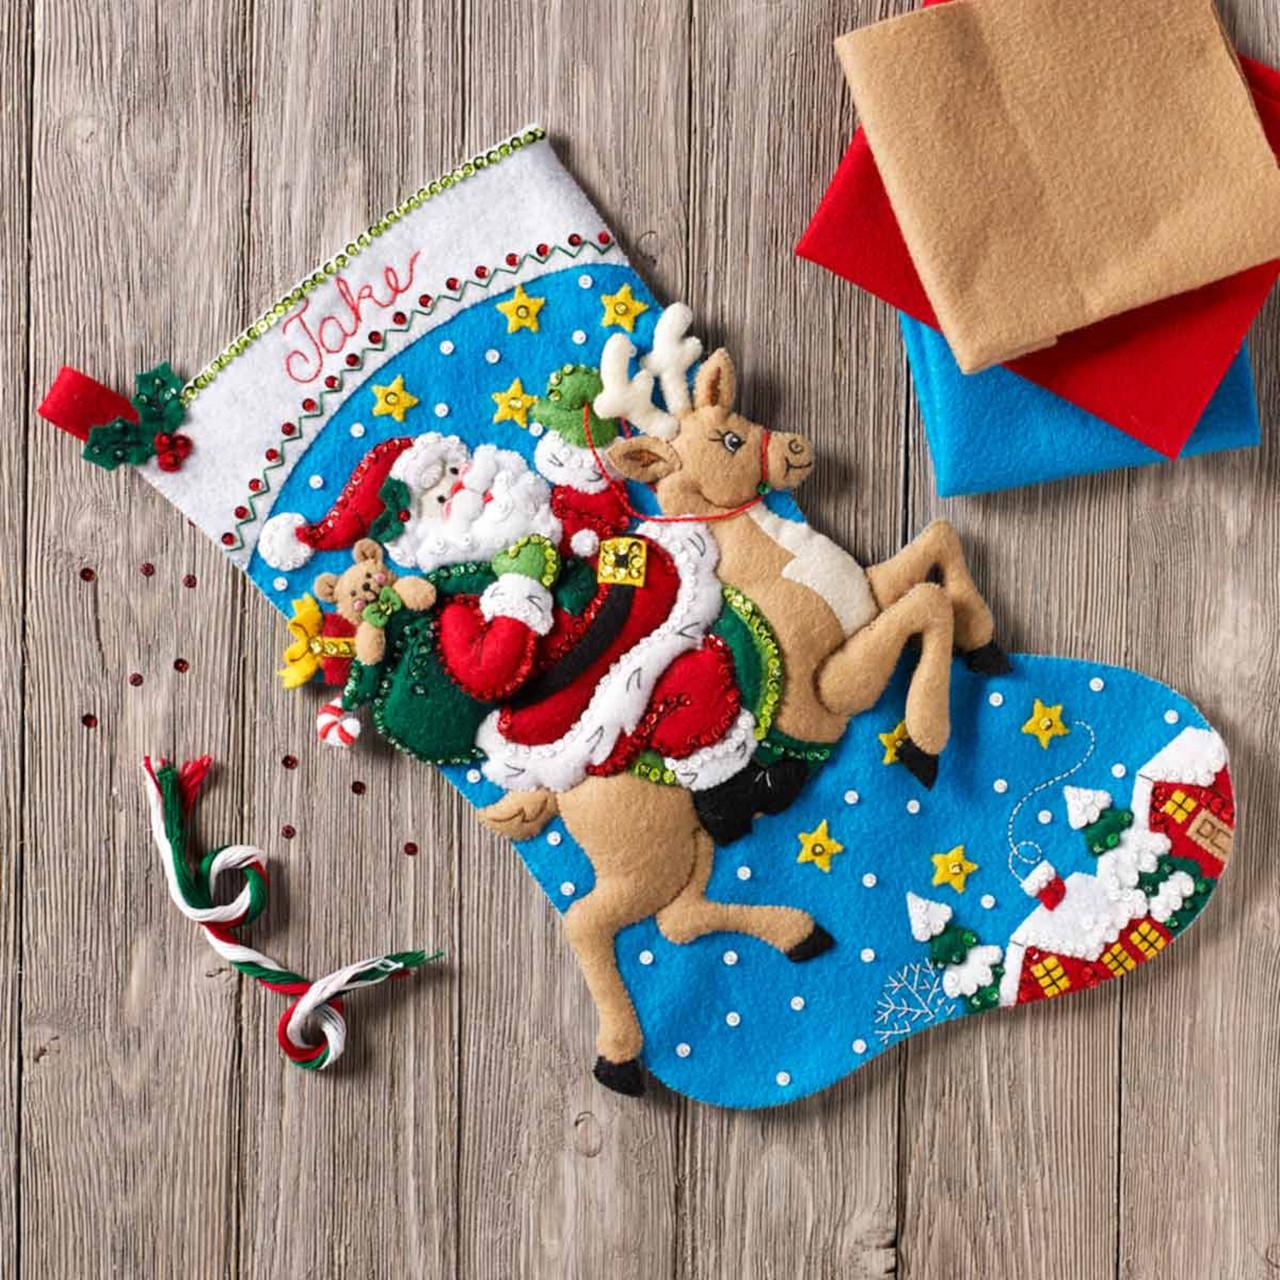 Plaid / Bucilla -  Reindeer Santa Stocking